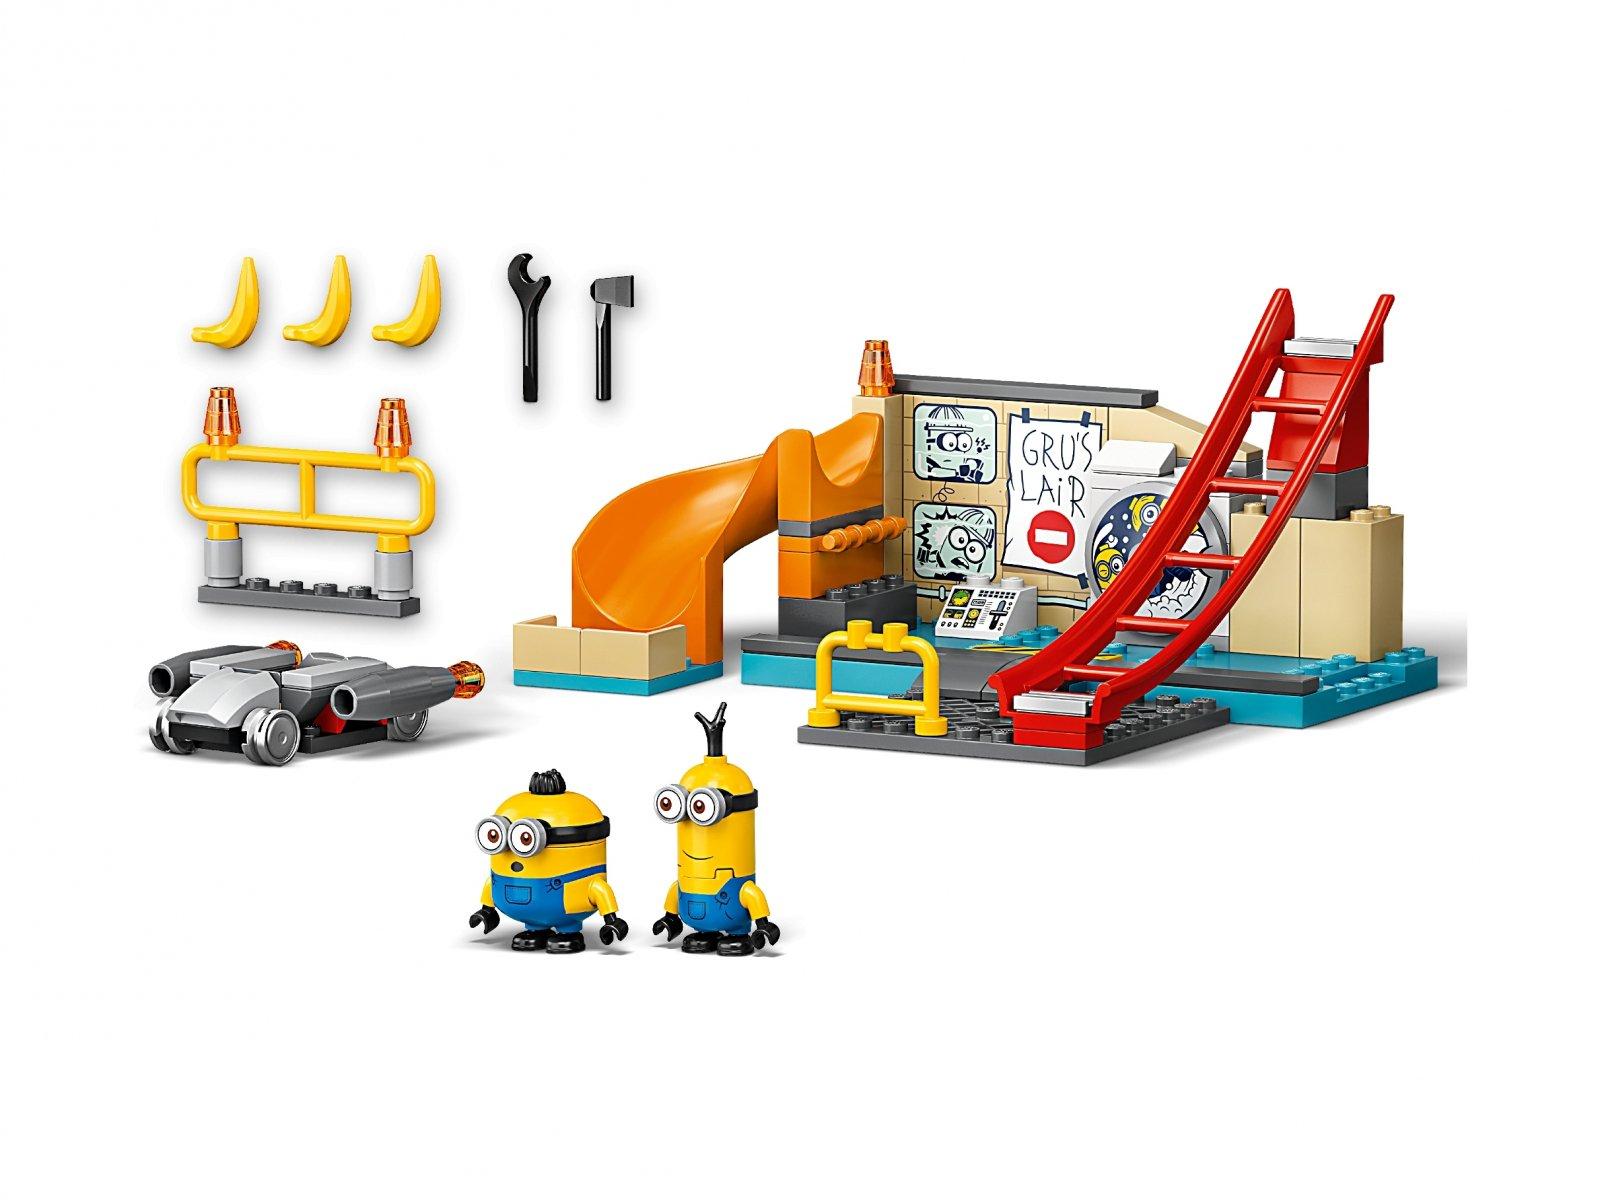 LEGO 75546 Minionki w laboratorium Gru